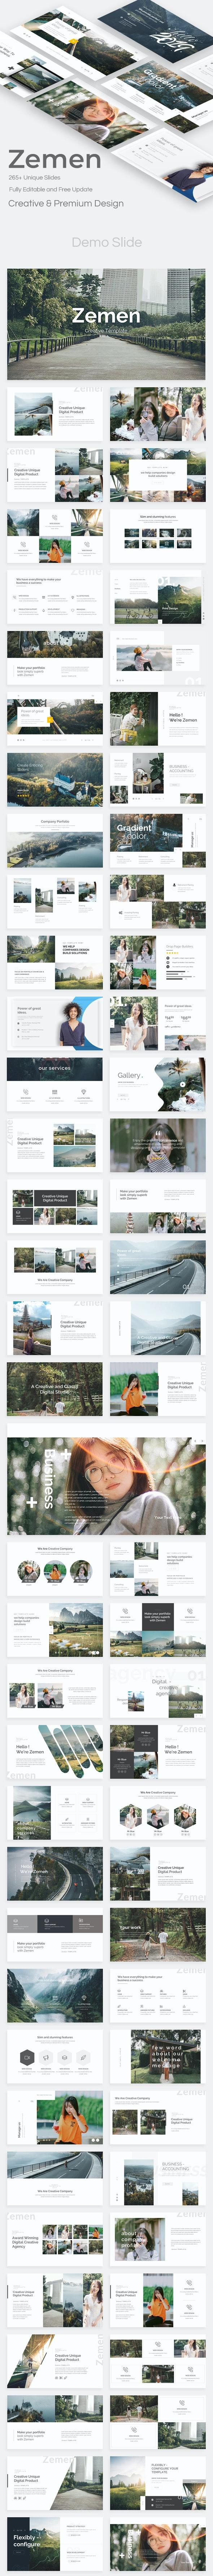 Zemen Premium Powerpoint Template - Creative PowerPoint Templates